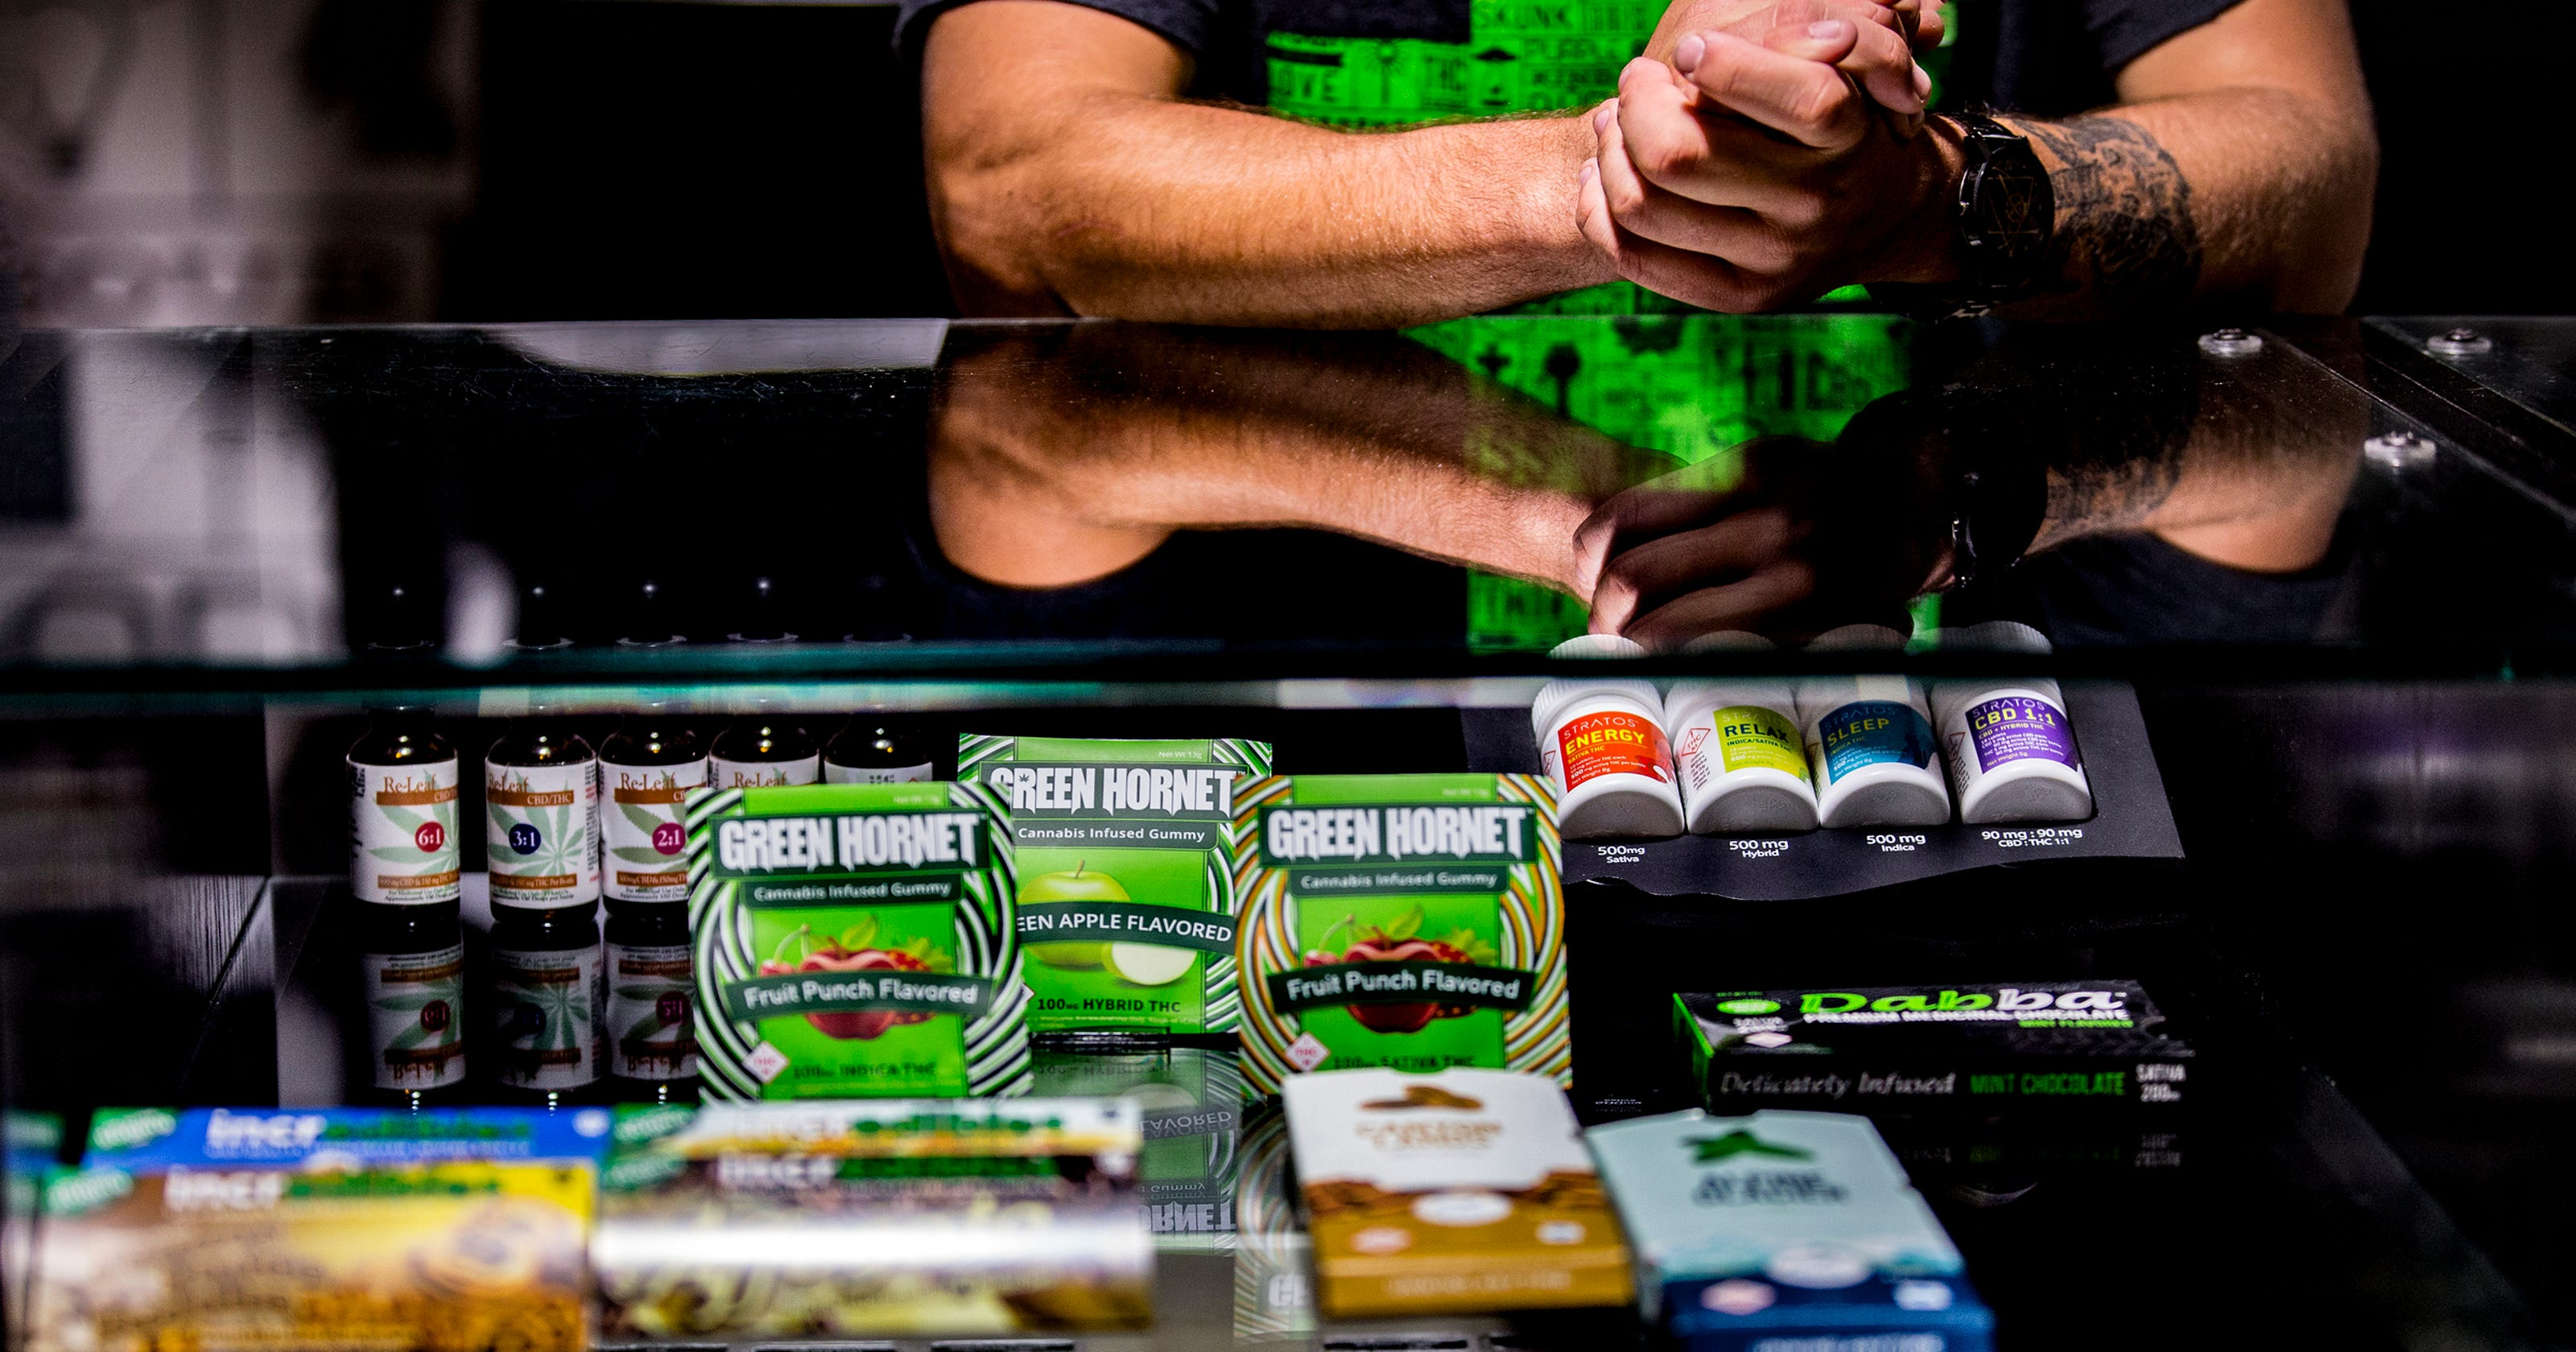 These marijuana edibles are prohibited by Michigan regulators